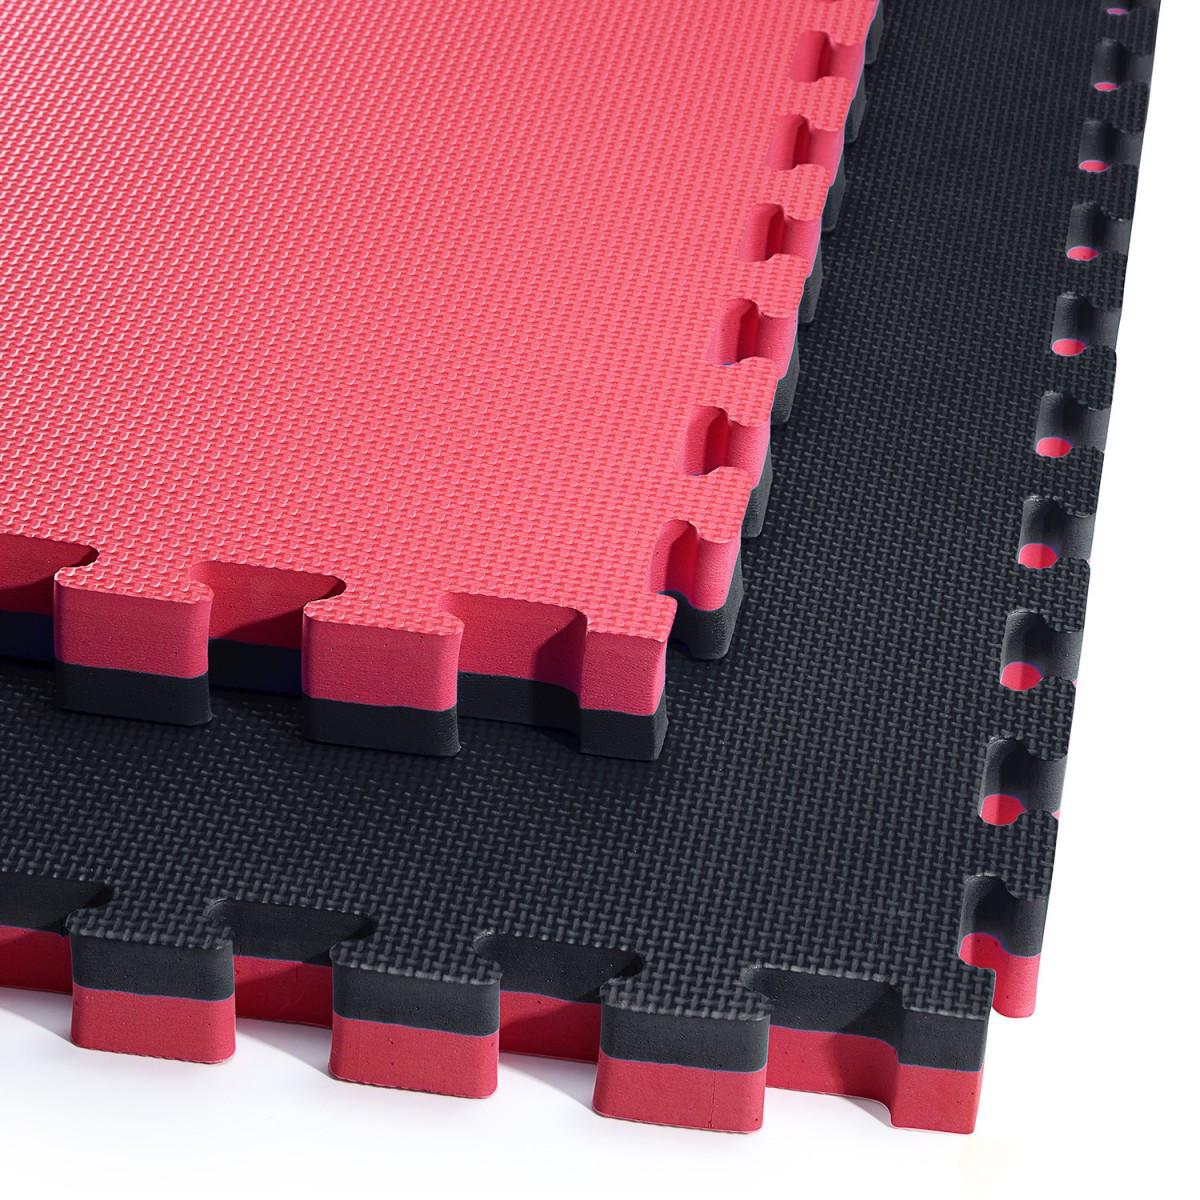 Мат пазл (ласточкин хвост) коврик татами 4FIZJO Mat Puzzle EVA 100 x 100 x 4 cм 4FJ0199 Black/Red